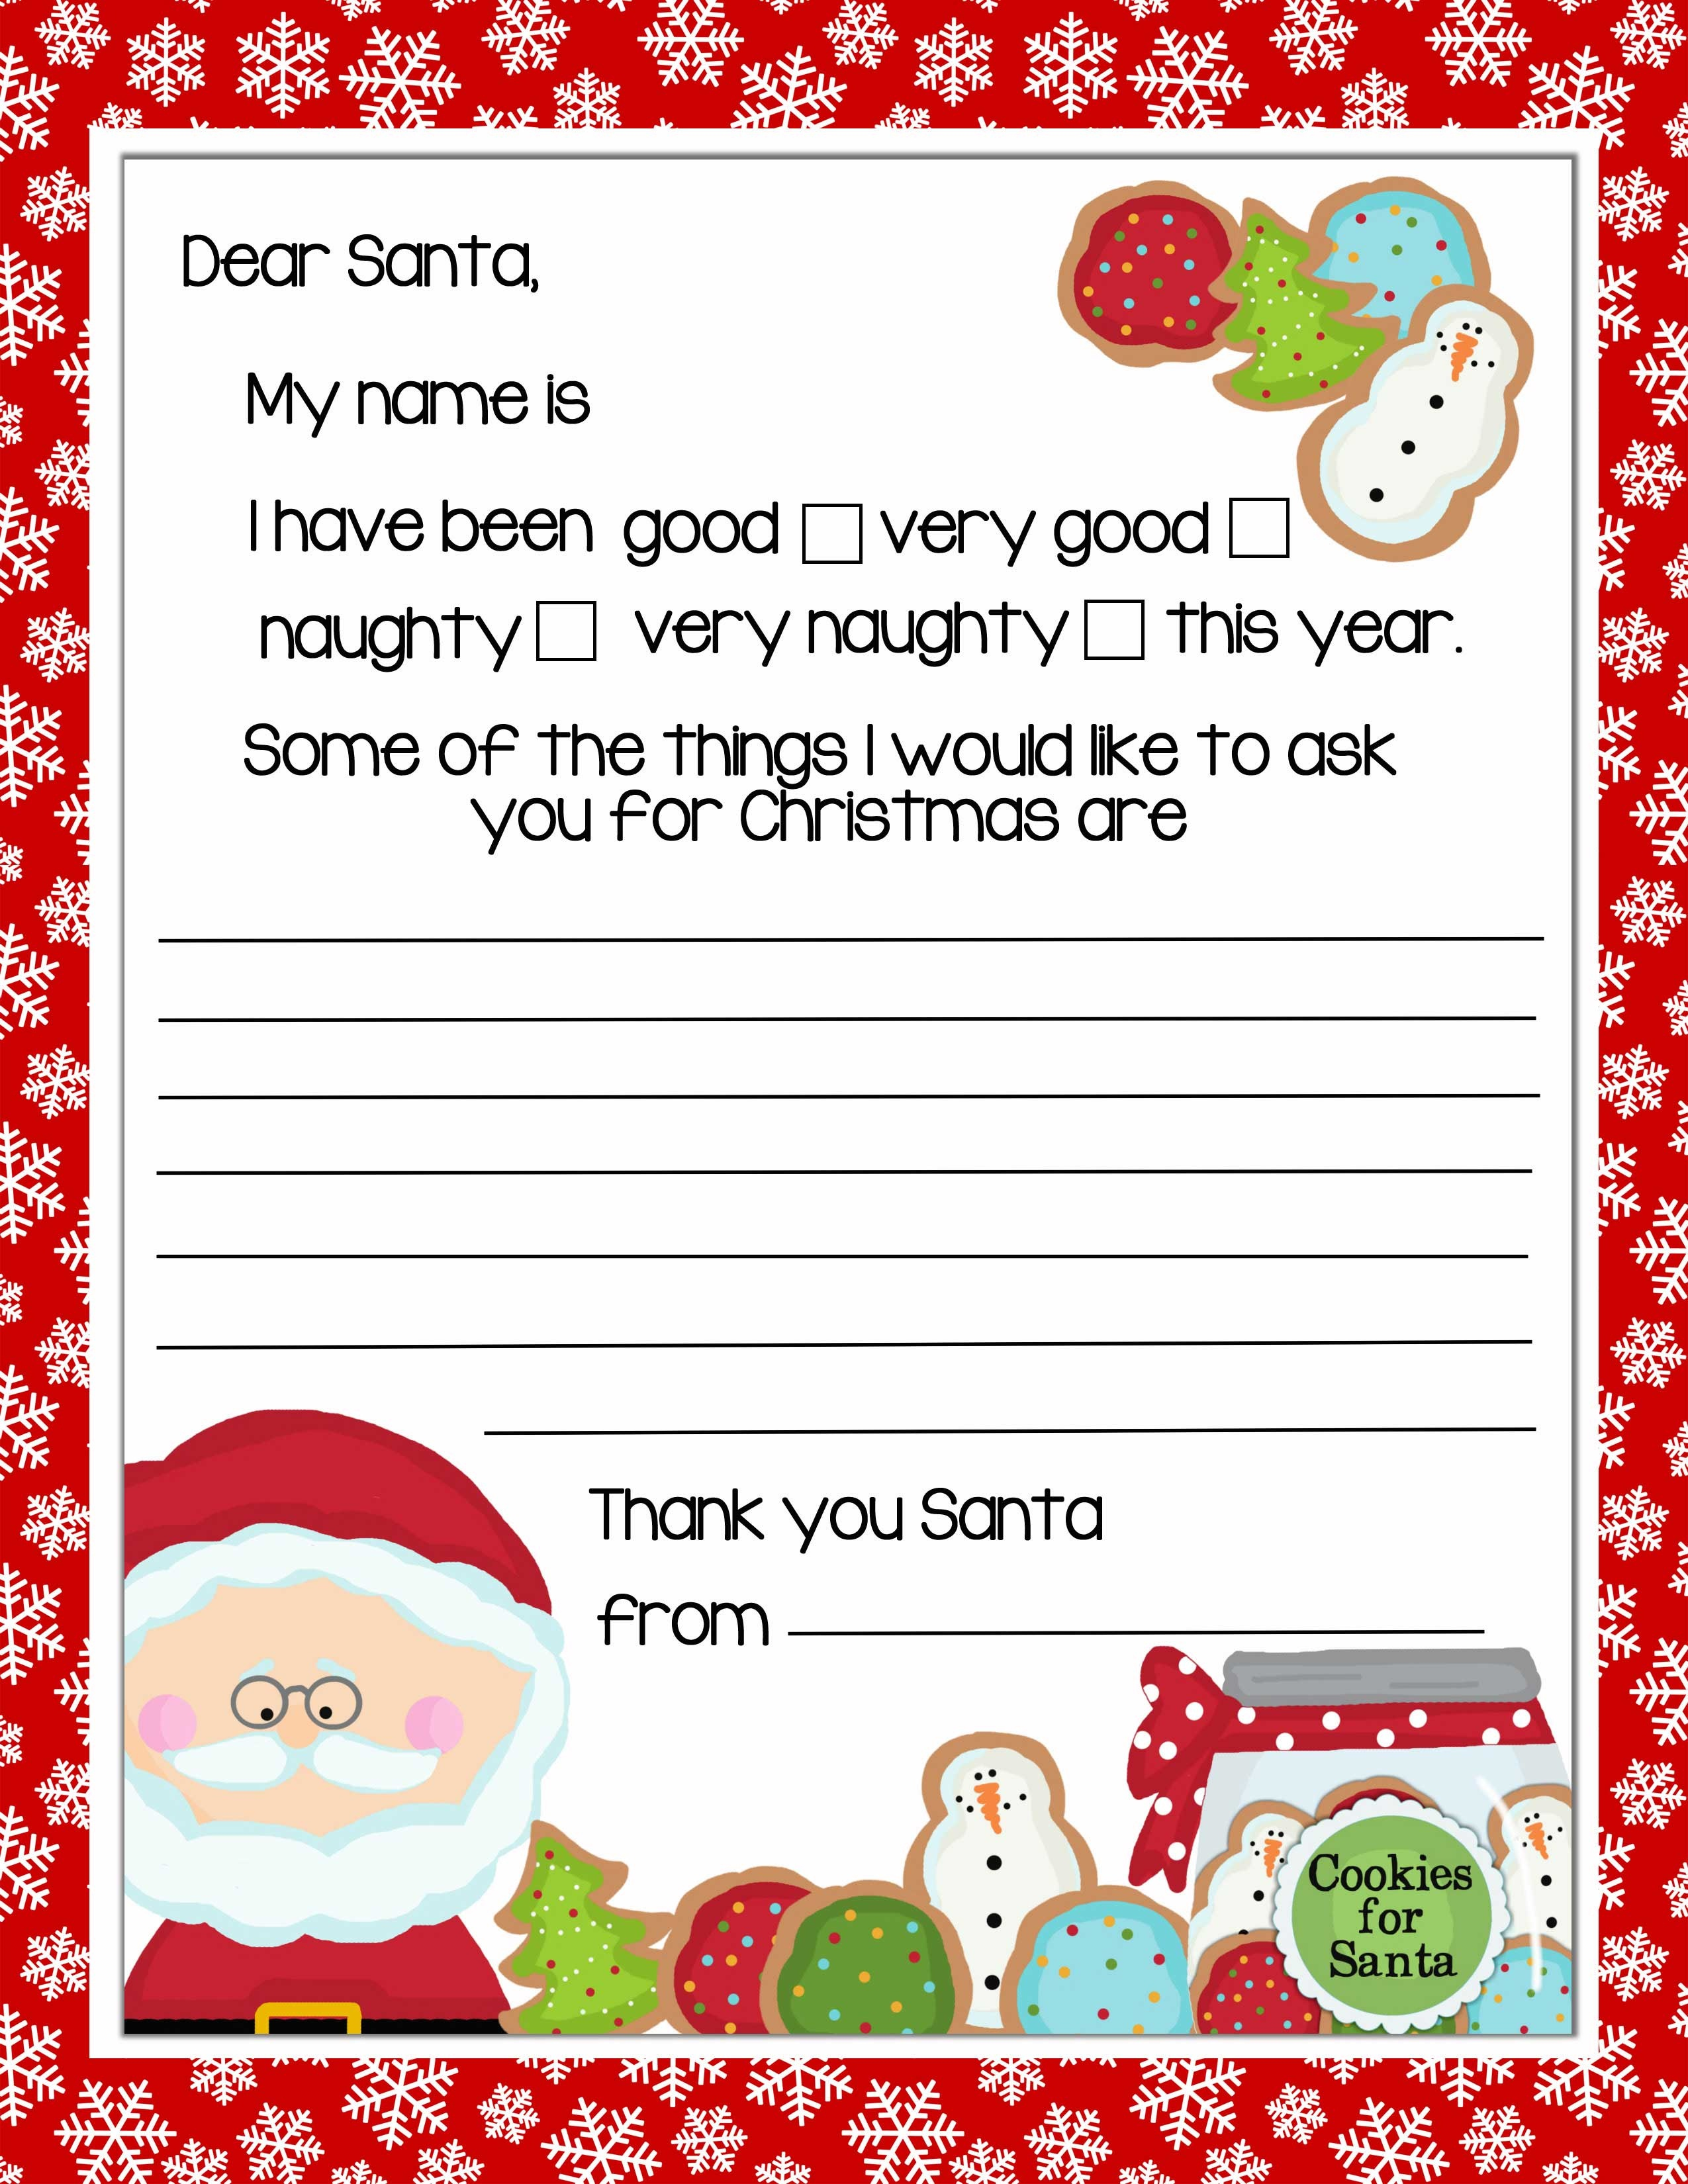 Printable Letter To Santa With Christmas Cookies - Letter To Santa Template Free Printable